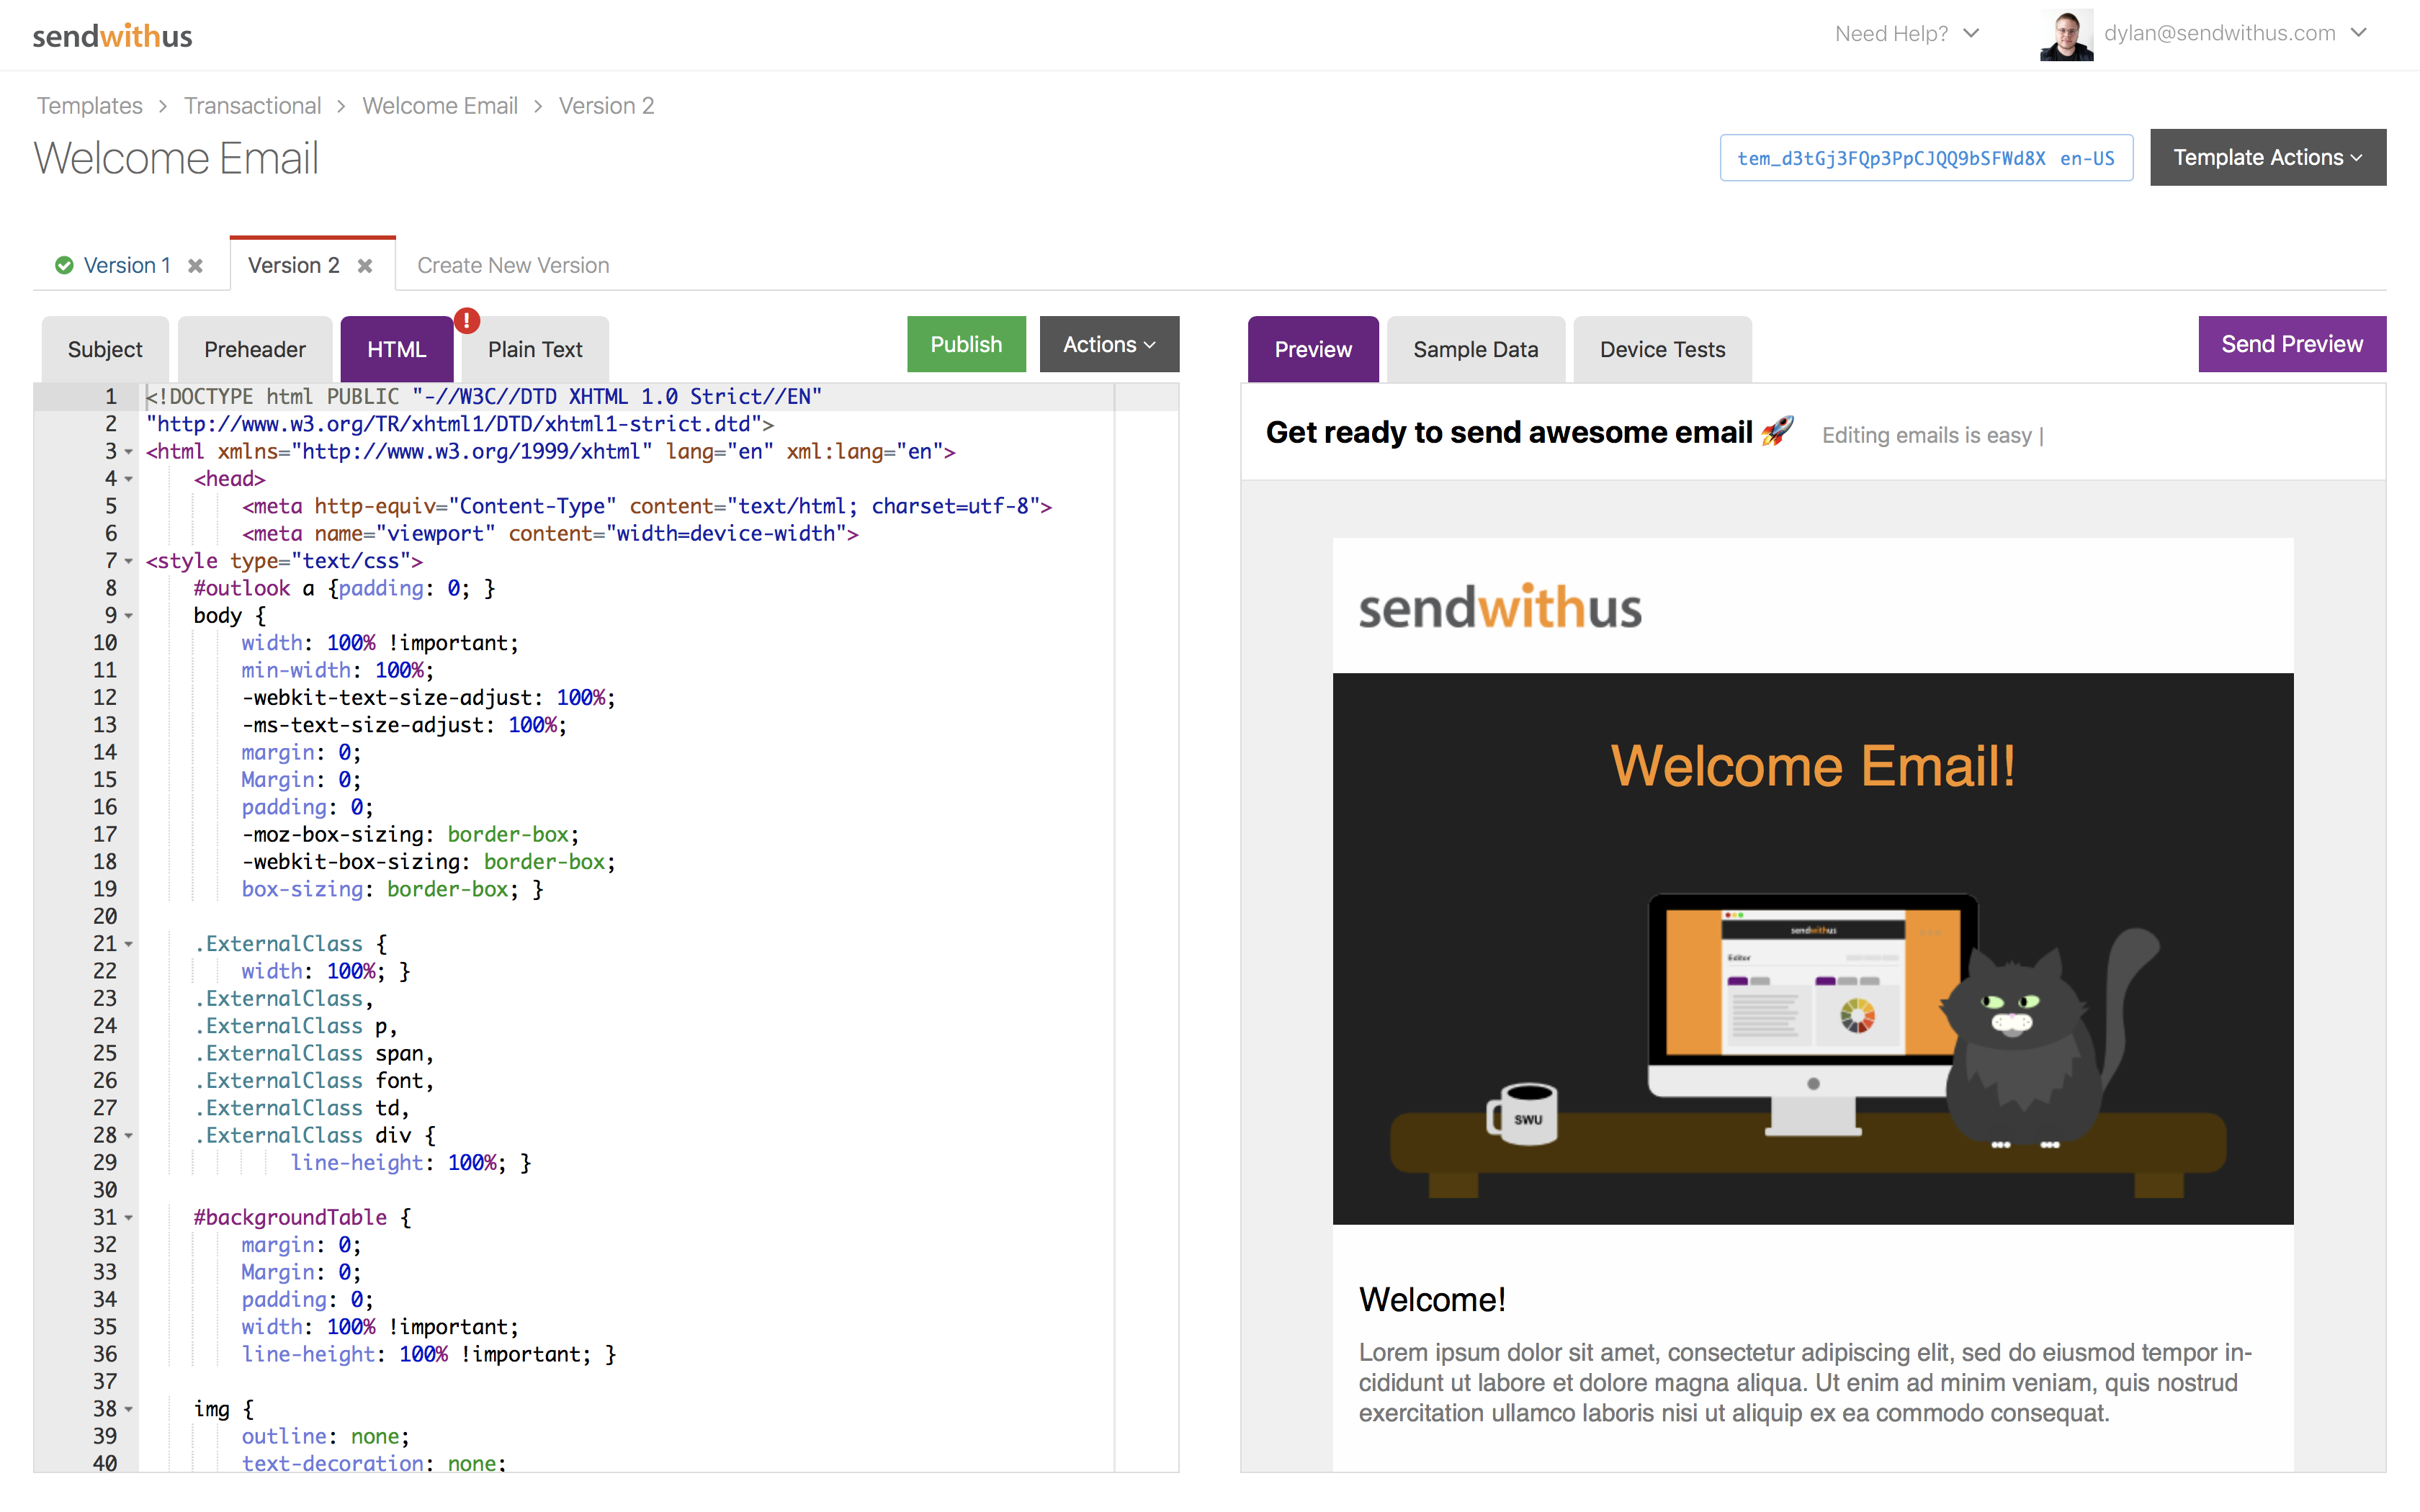 Sendwithus Demo - Visual Template Editor